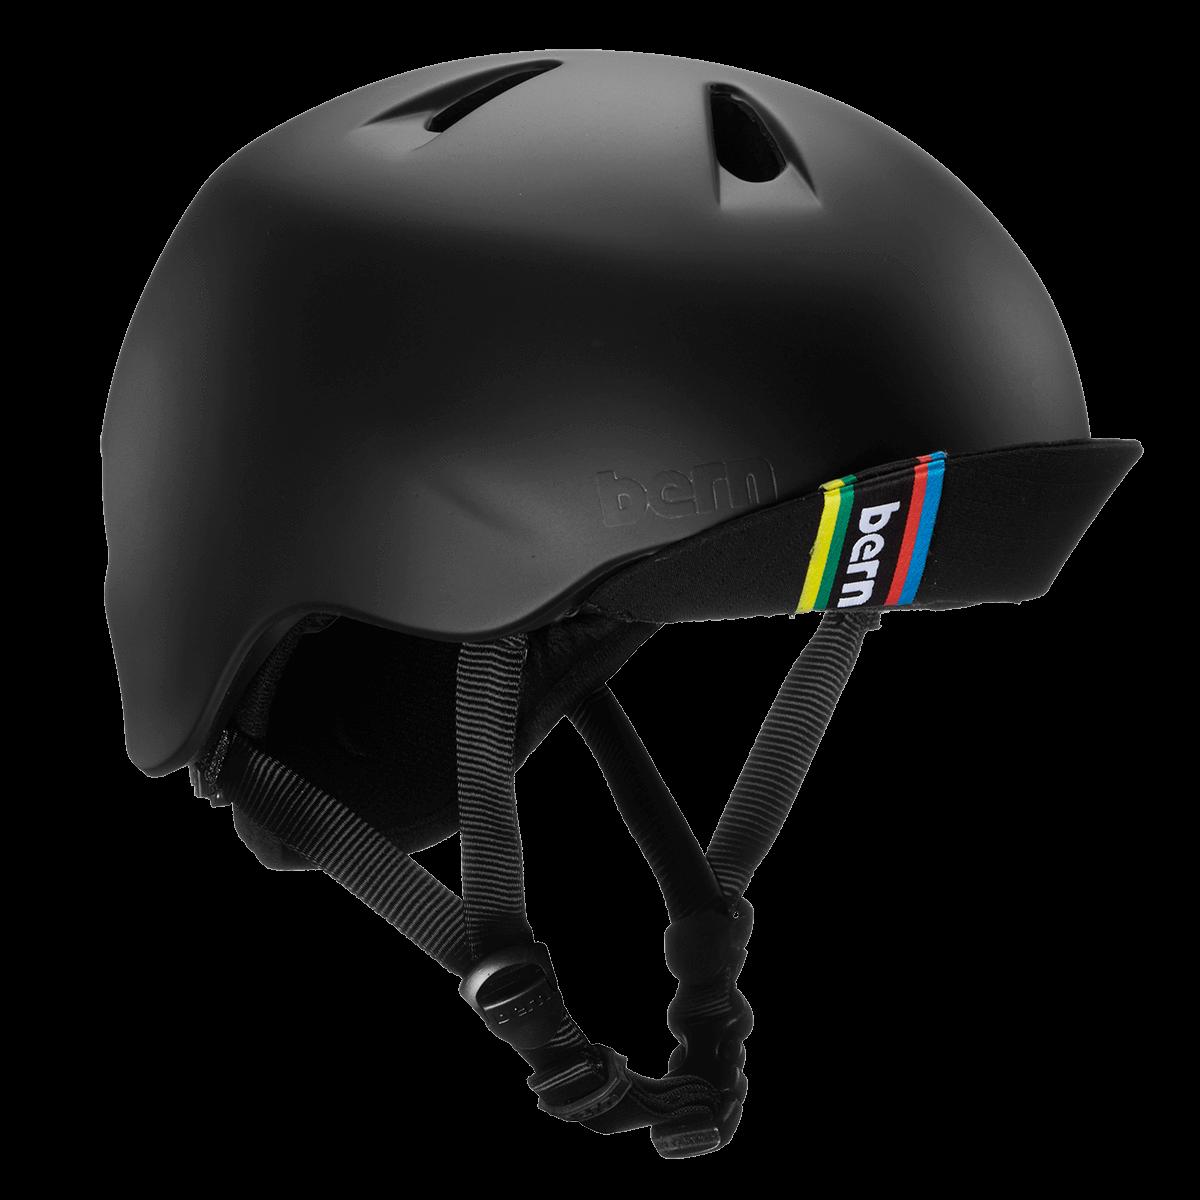 Casque Bern Nino-Matte-Black-Esprit vélo